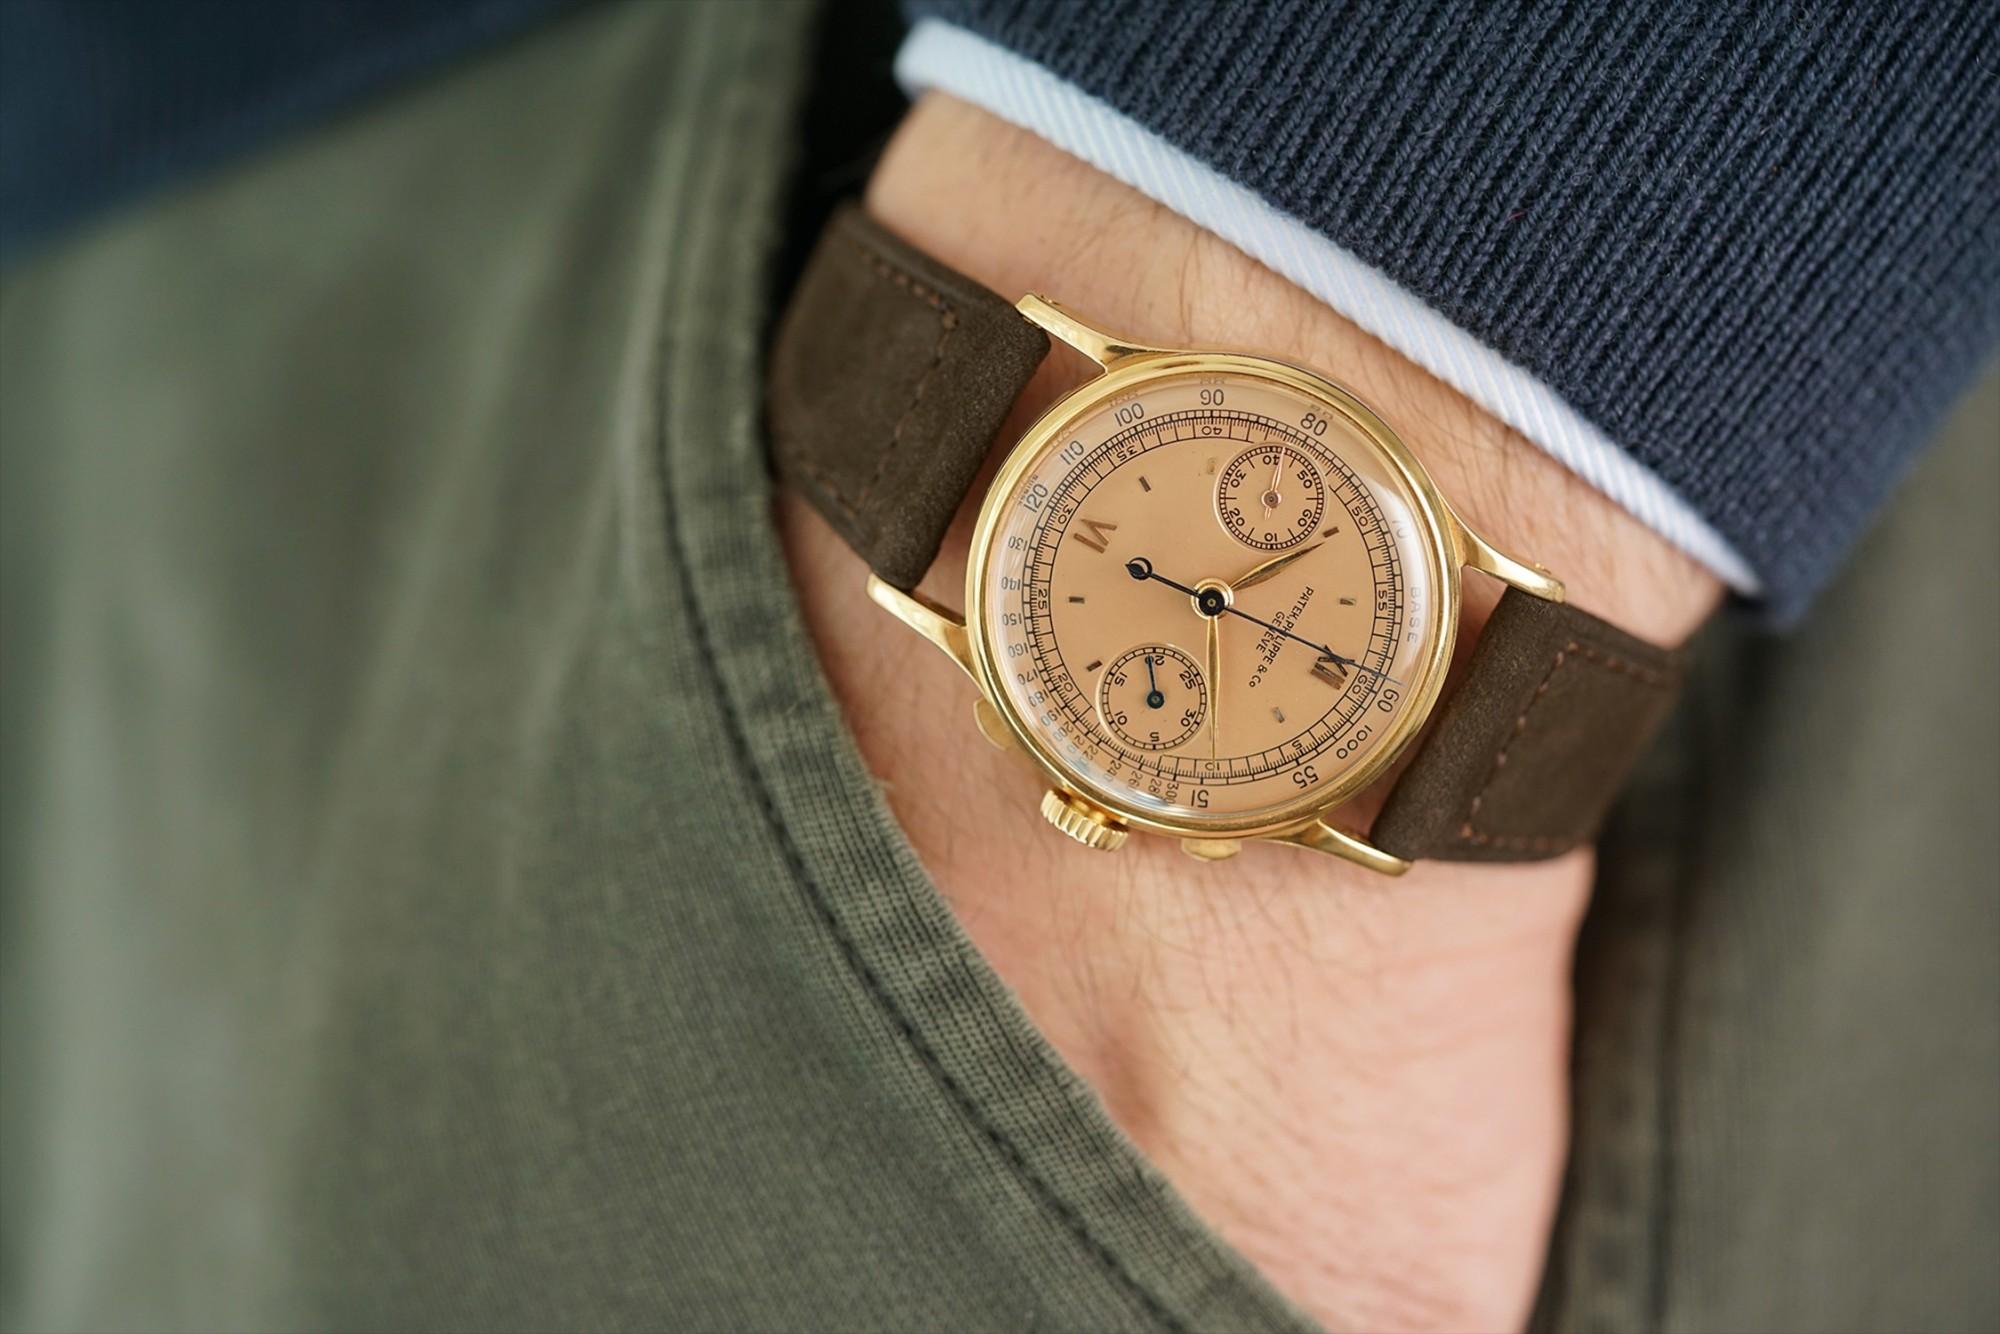 Patek Philippe Ref. 1436 split seconds chronograph, Patek 1436, Patek split seconds, Patek rattrapante